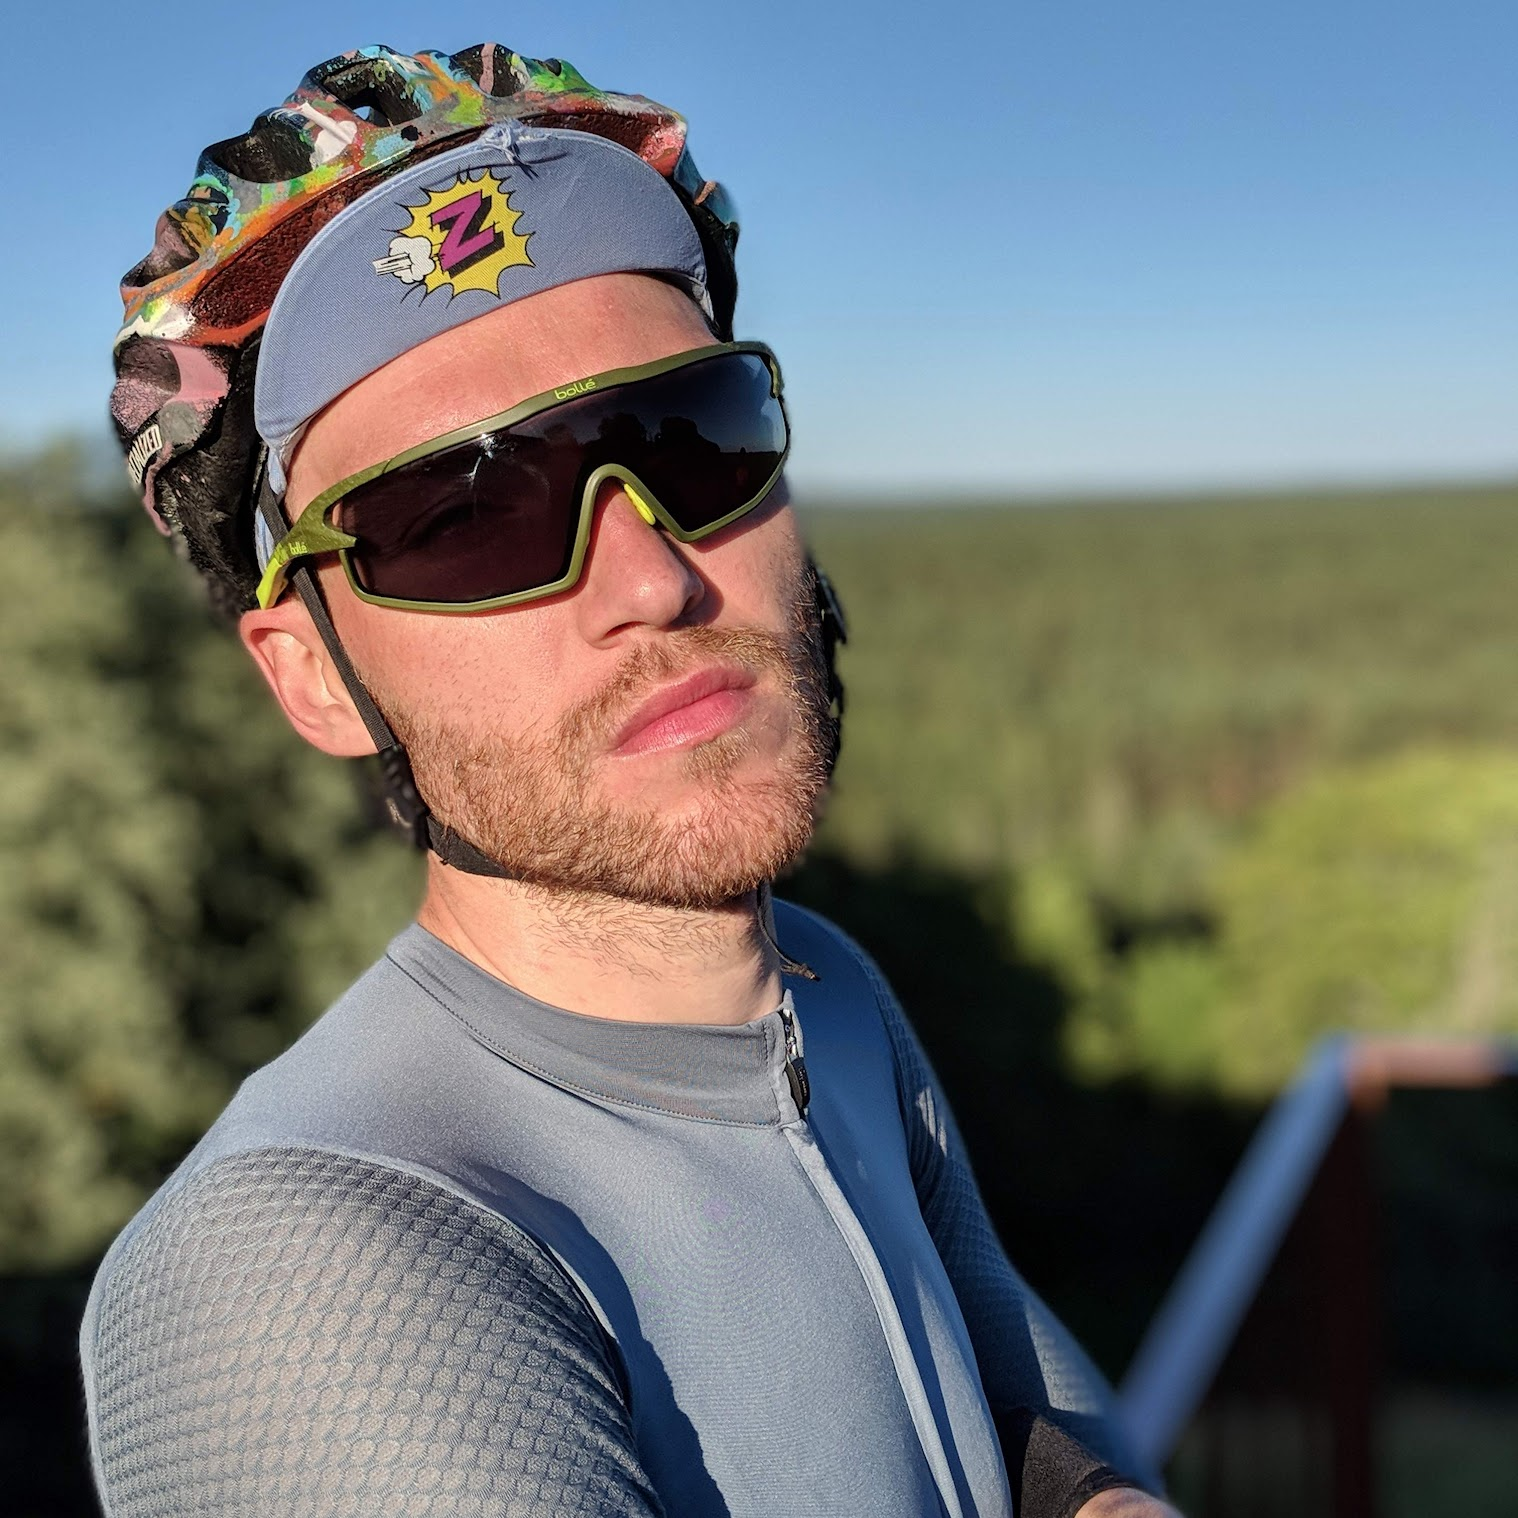 b57edbbfdf Bolle B-Rock Cycling Sunglasses. Rapha Cap. POC Cap   LFGSS